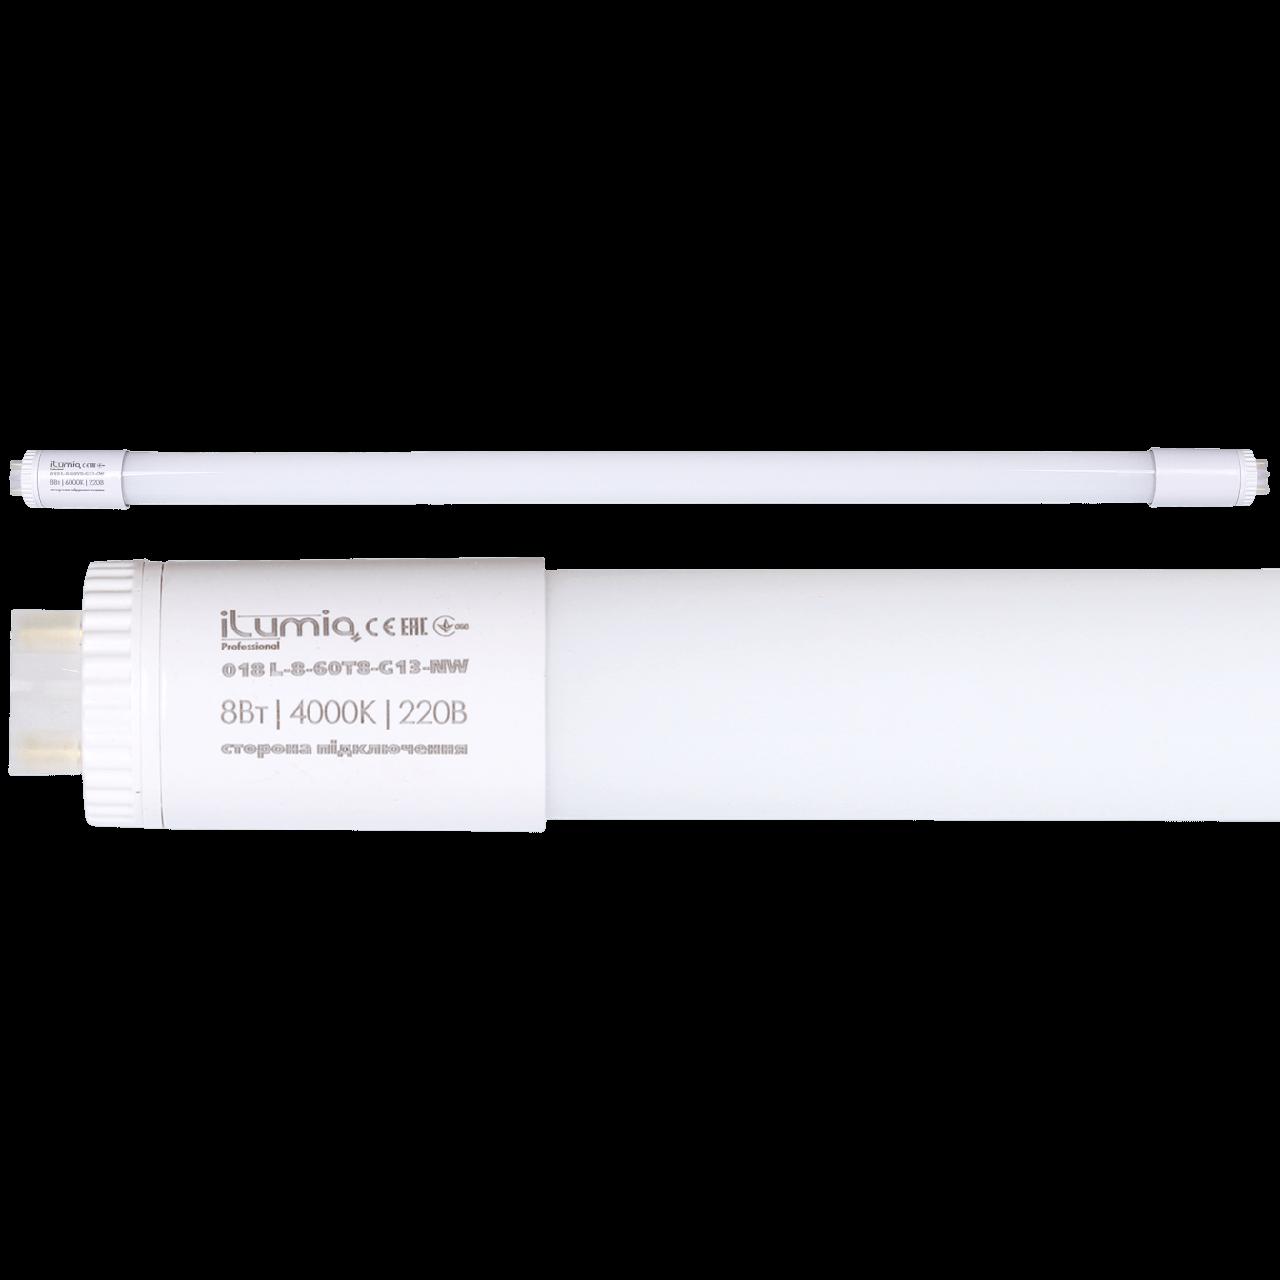 LED лампа Ilumia 8W G13 T8 600mm 4000К нейтральный 900Lm (018)